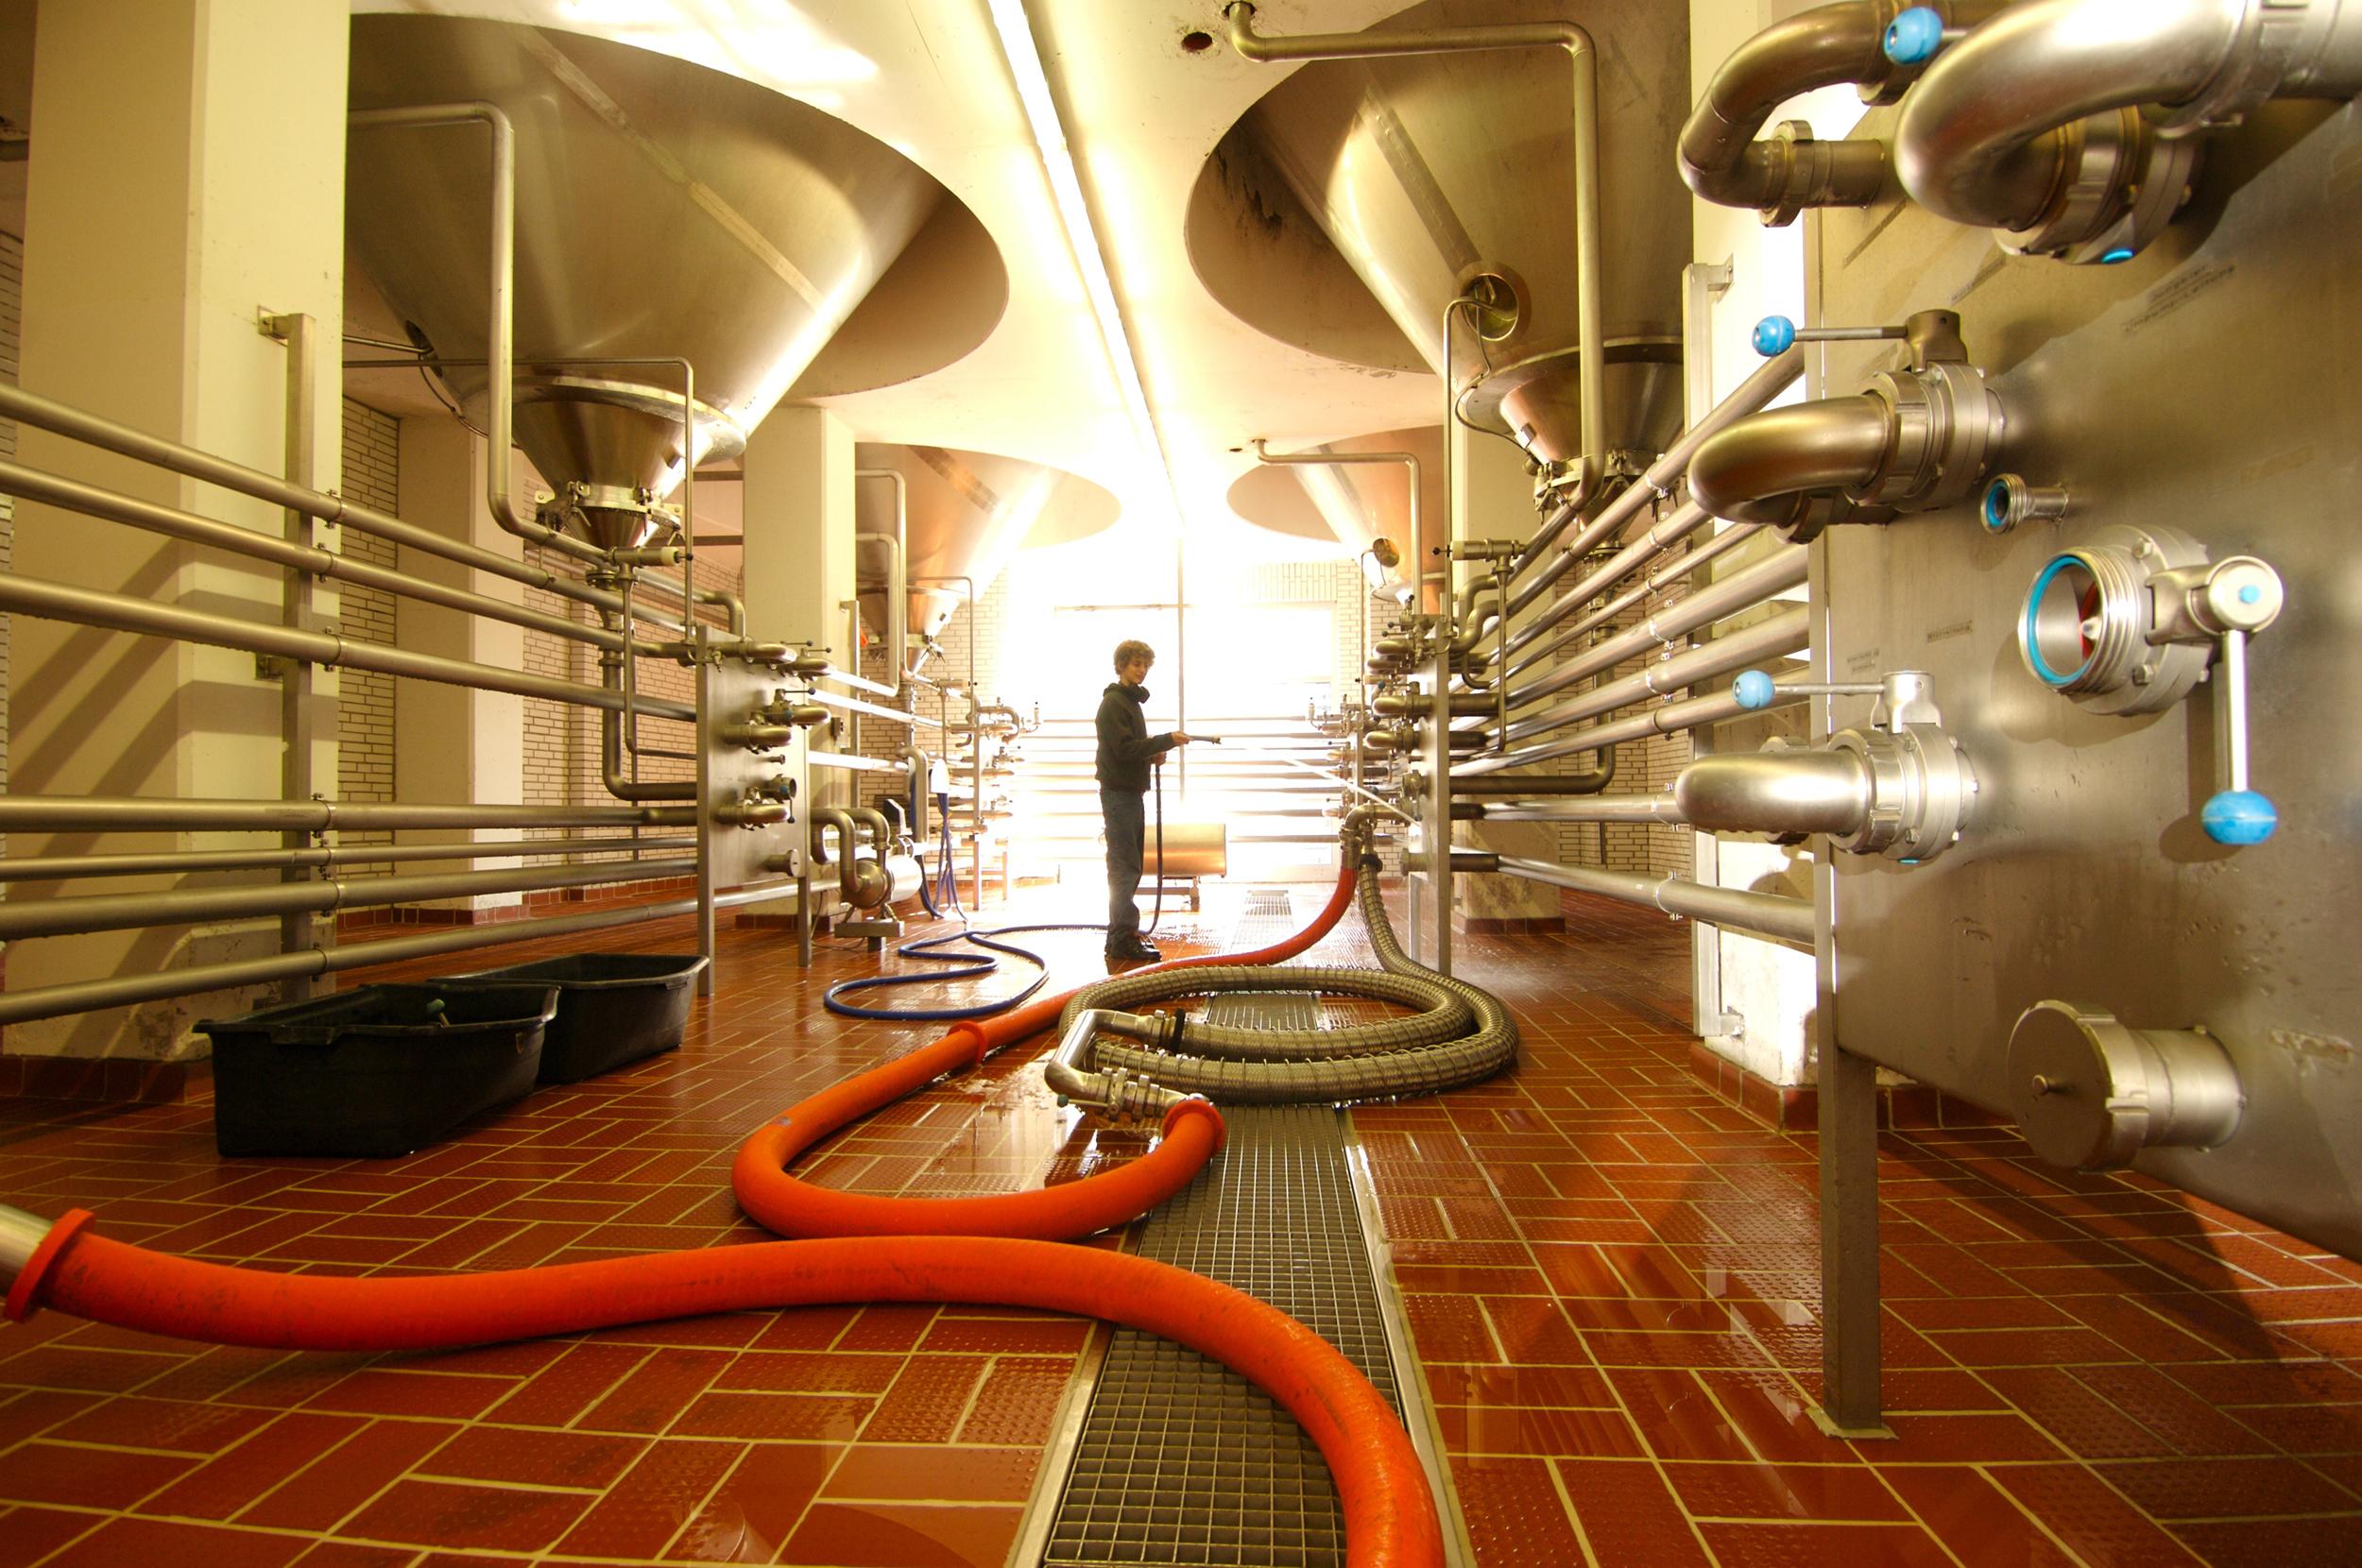 Brauerei Wittingen - Abfüllanlage